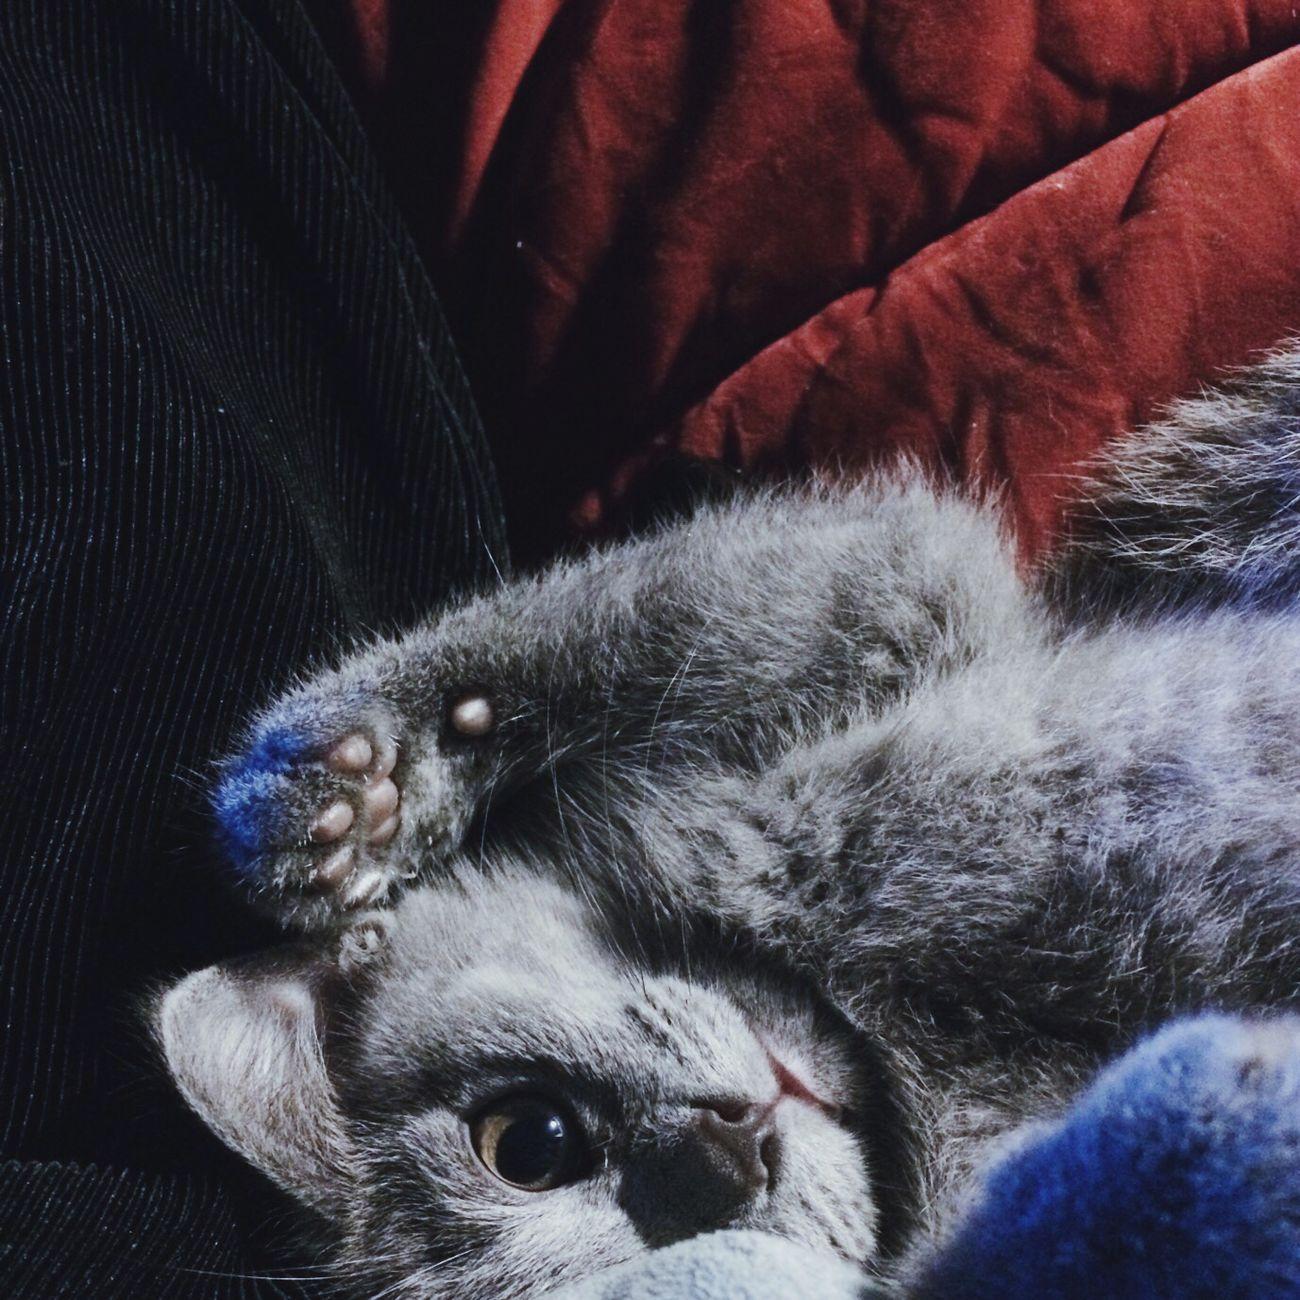 Pets Kitty Meow Meow🐱 Selfie ✌ Bluecat my new friend 😈